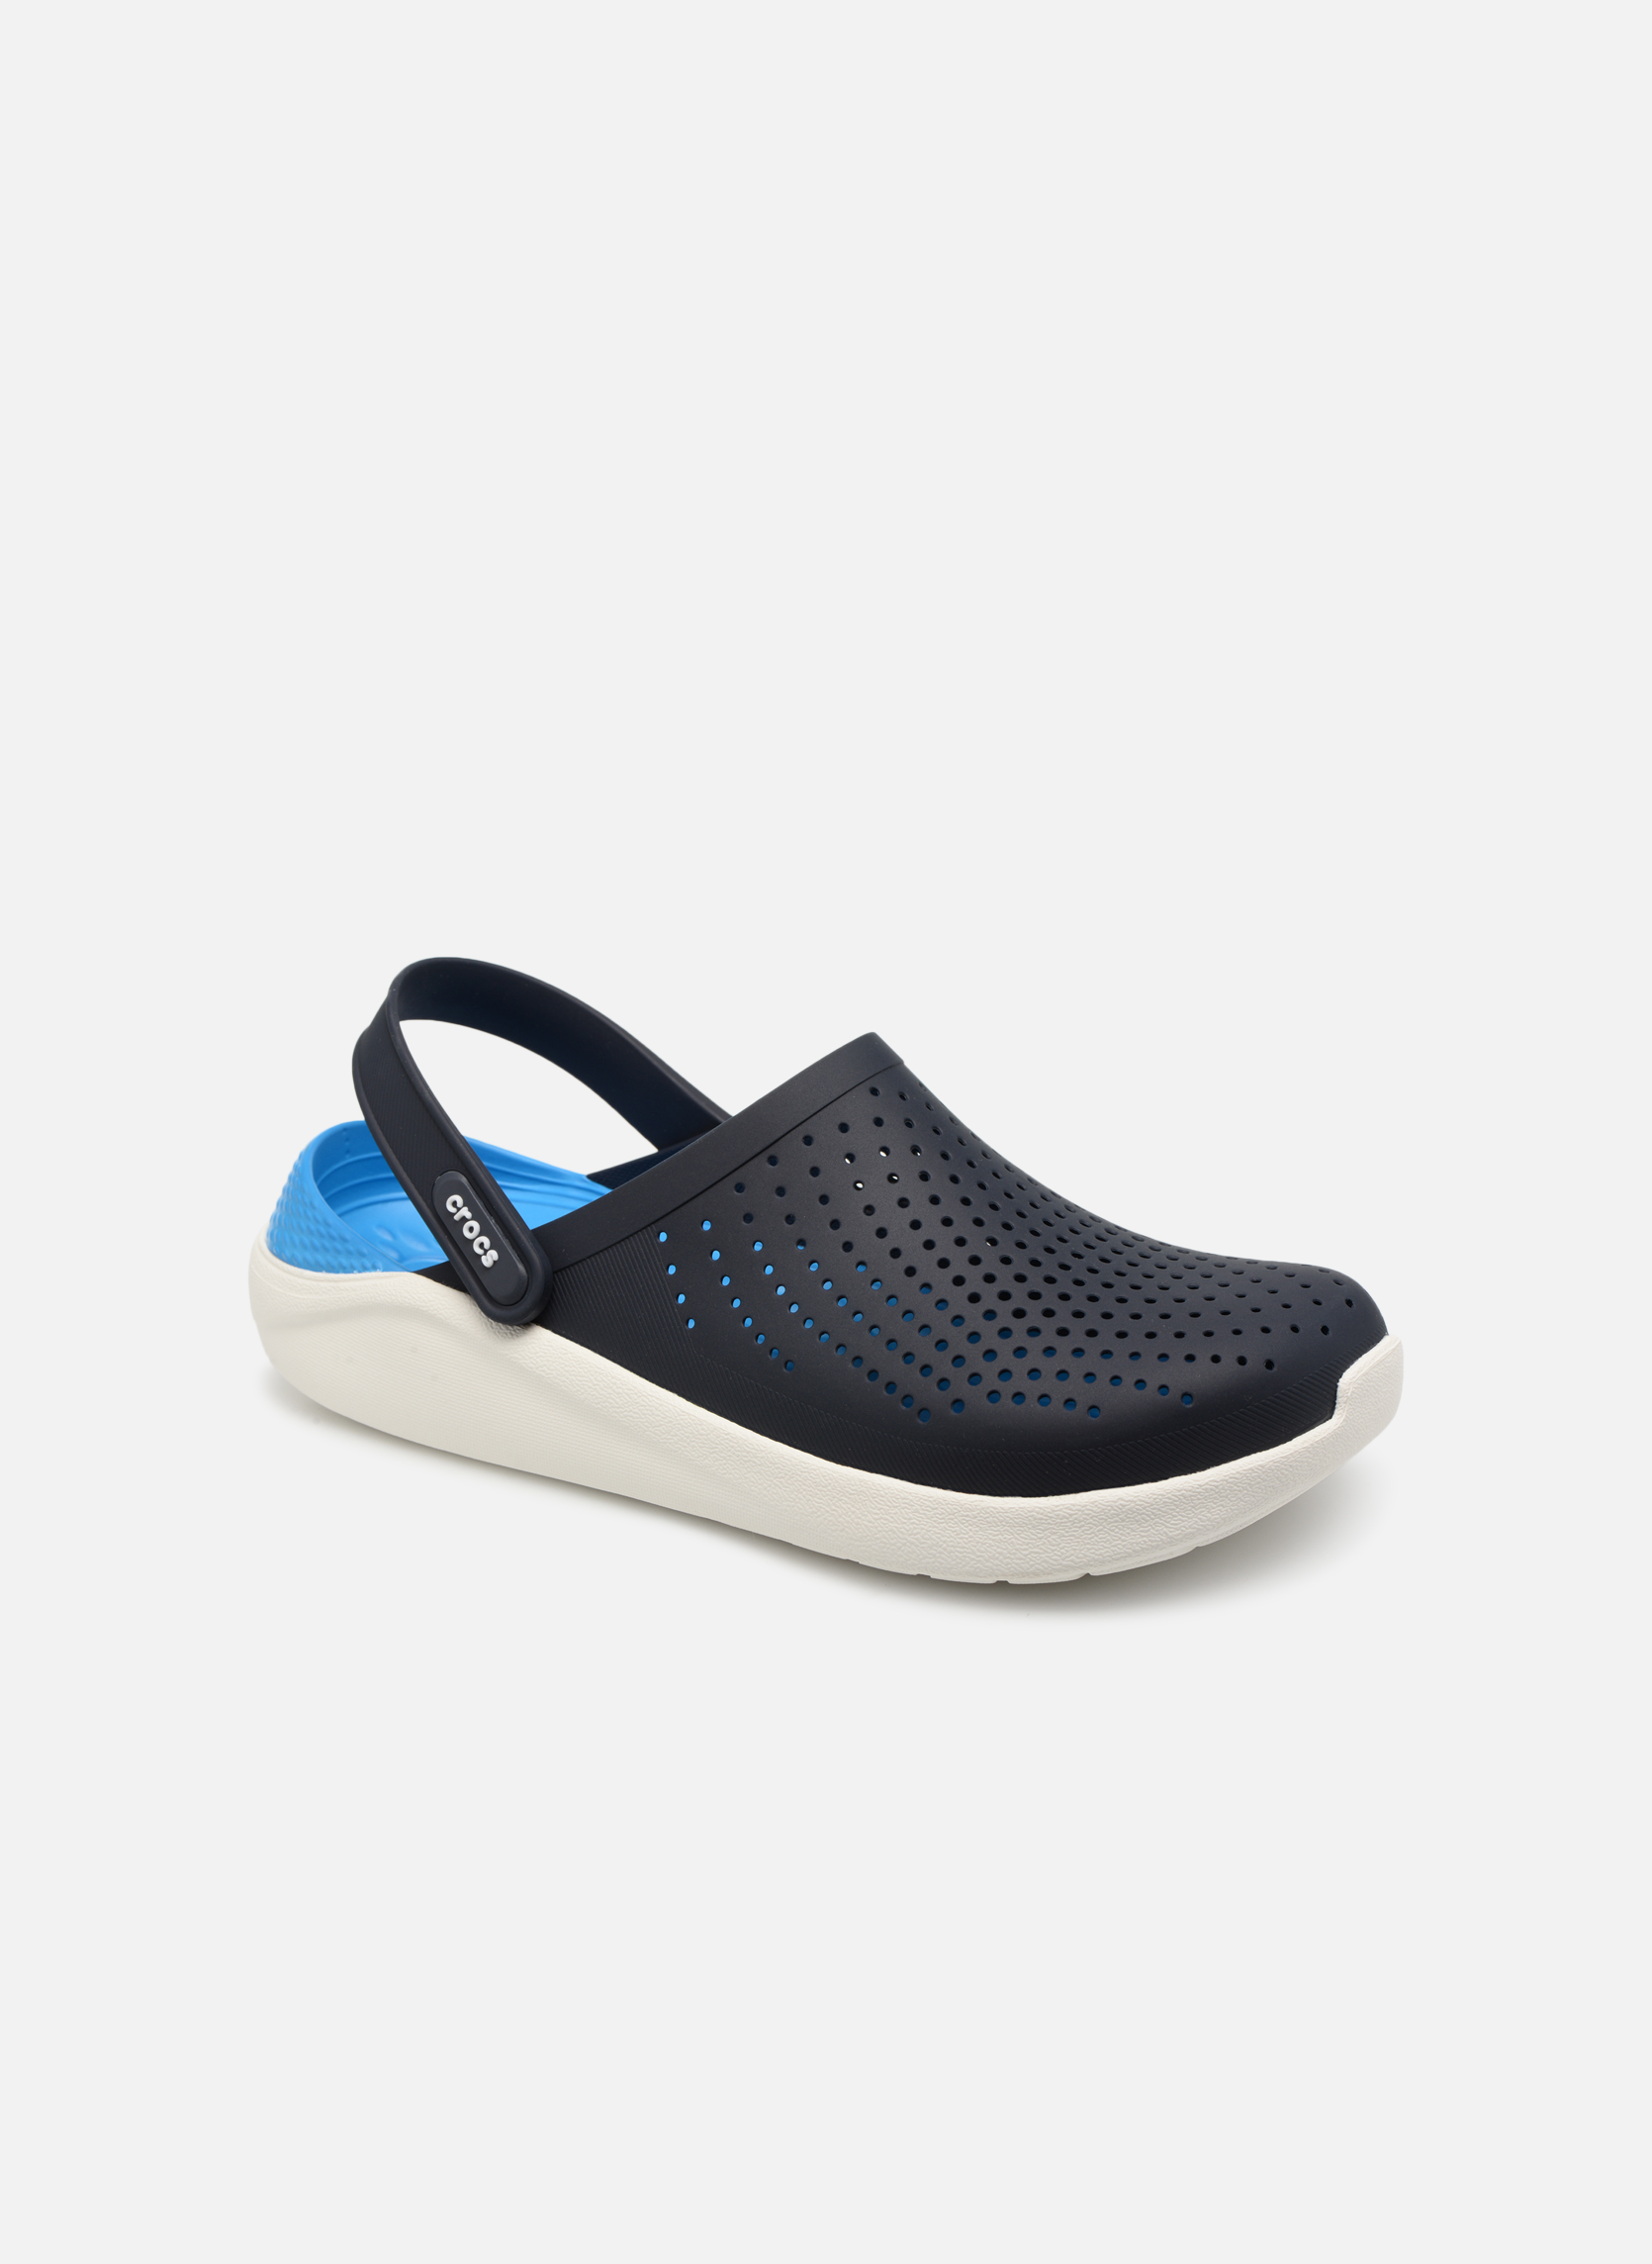 70f6aedbcea5 Crocs sandaler